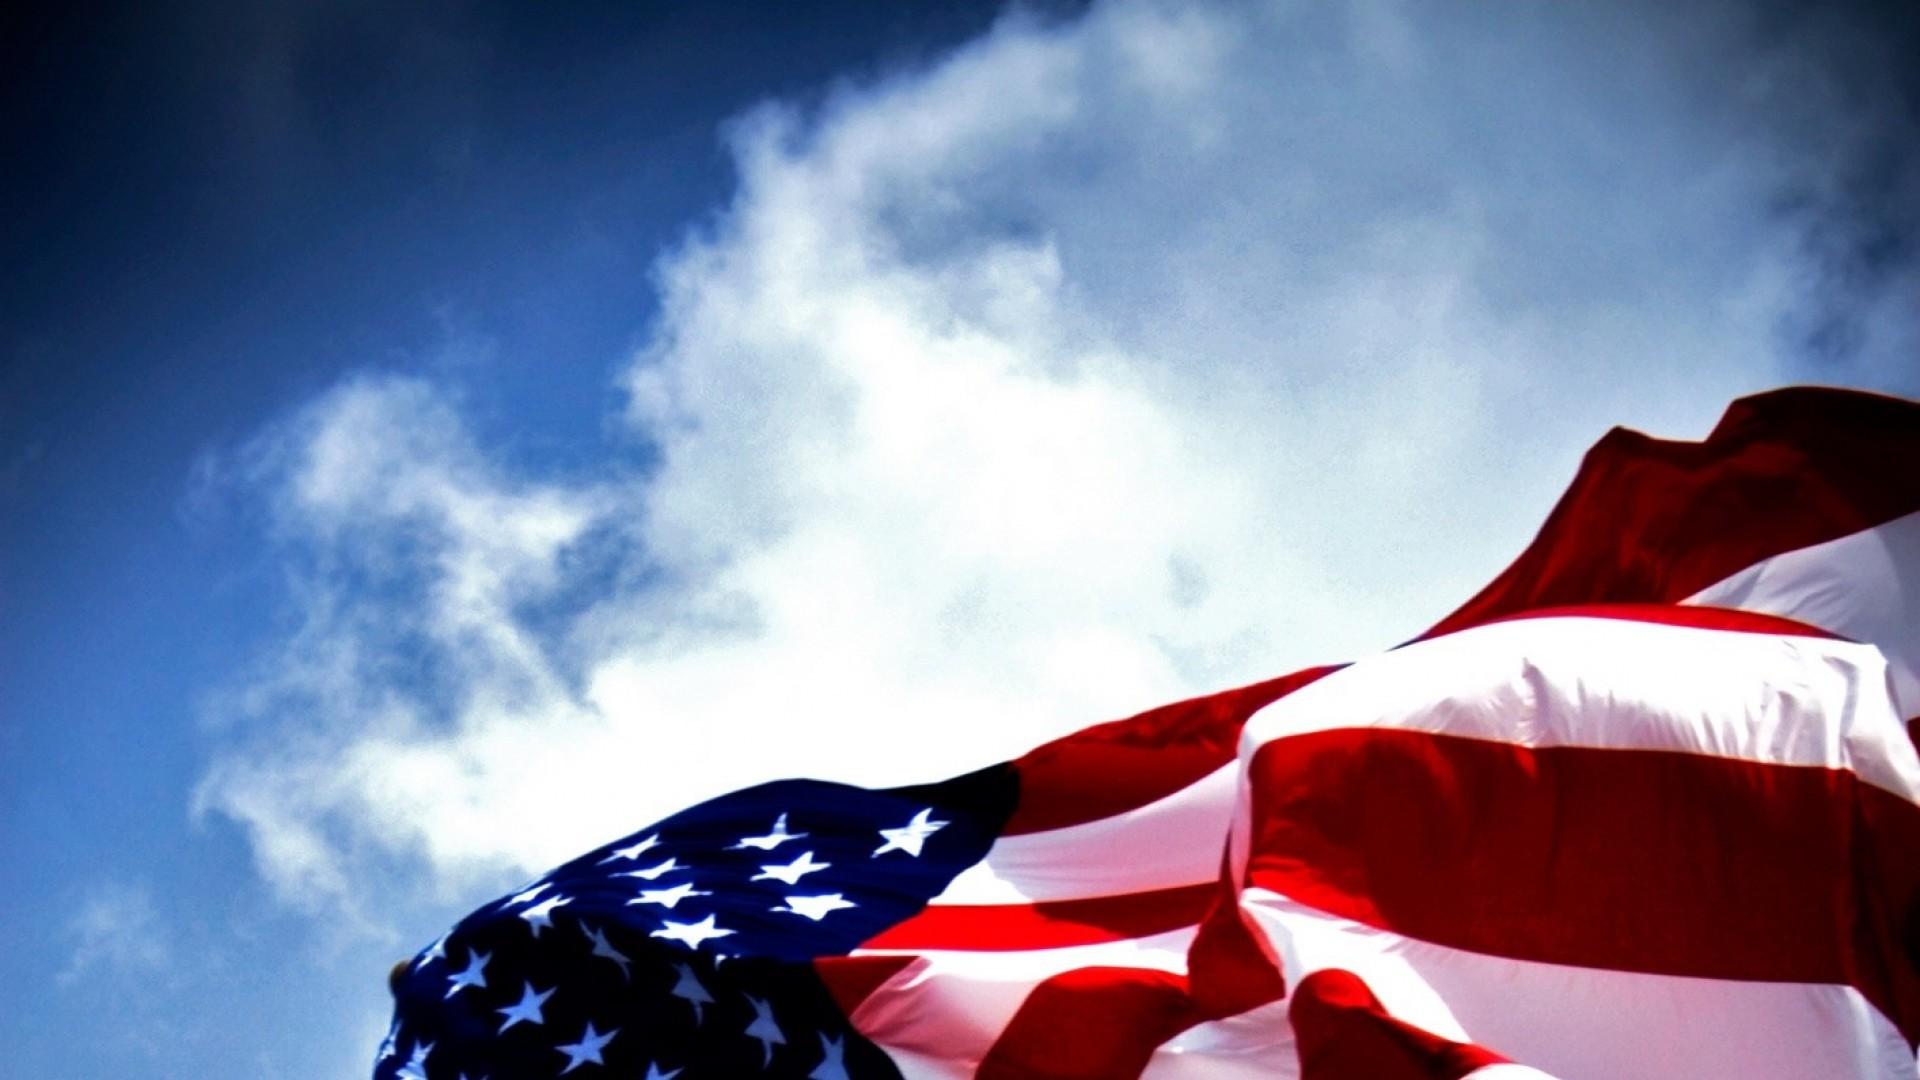 25 best ideas about <b>American flag wallpaper</b> on Pinterest